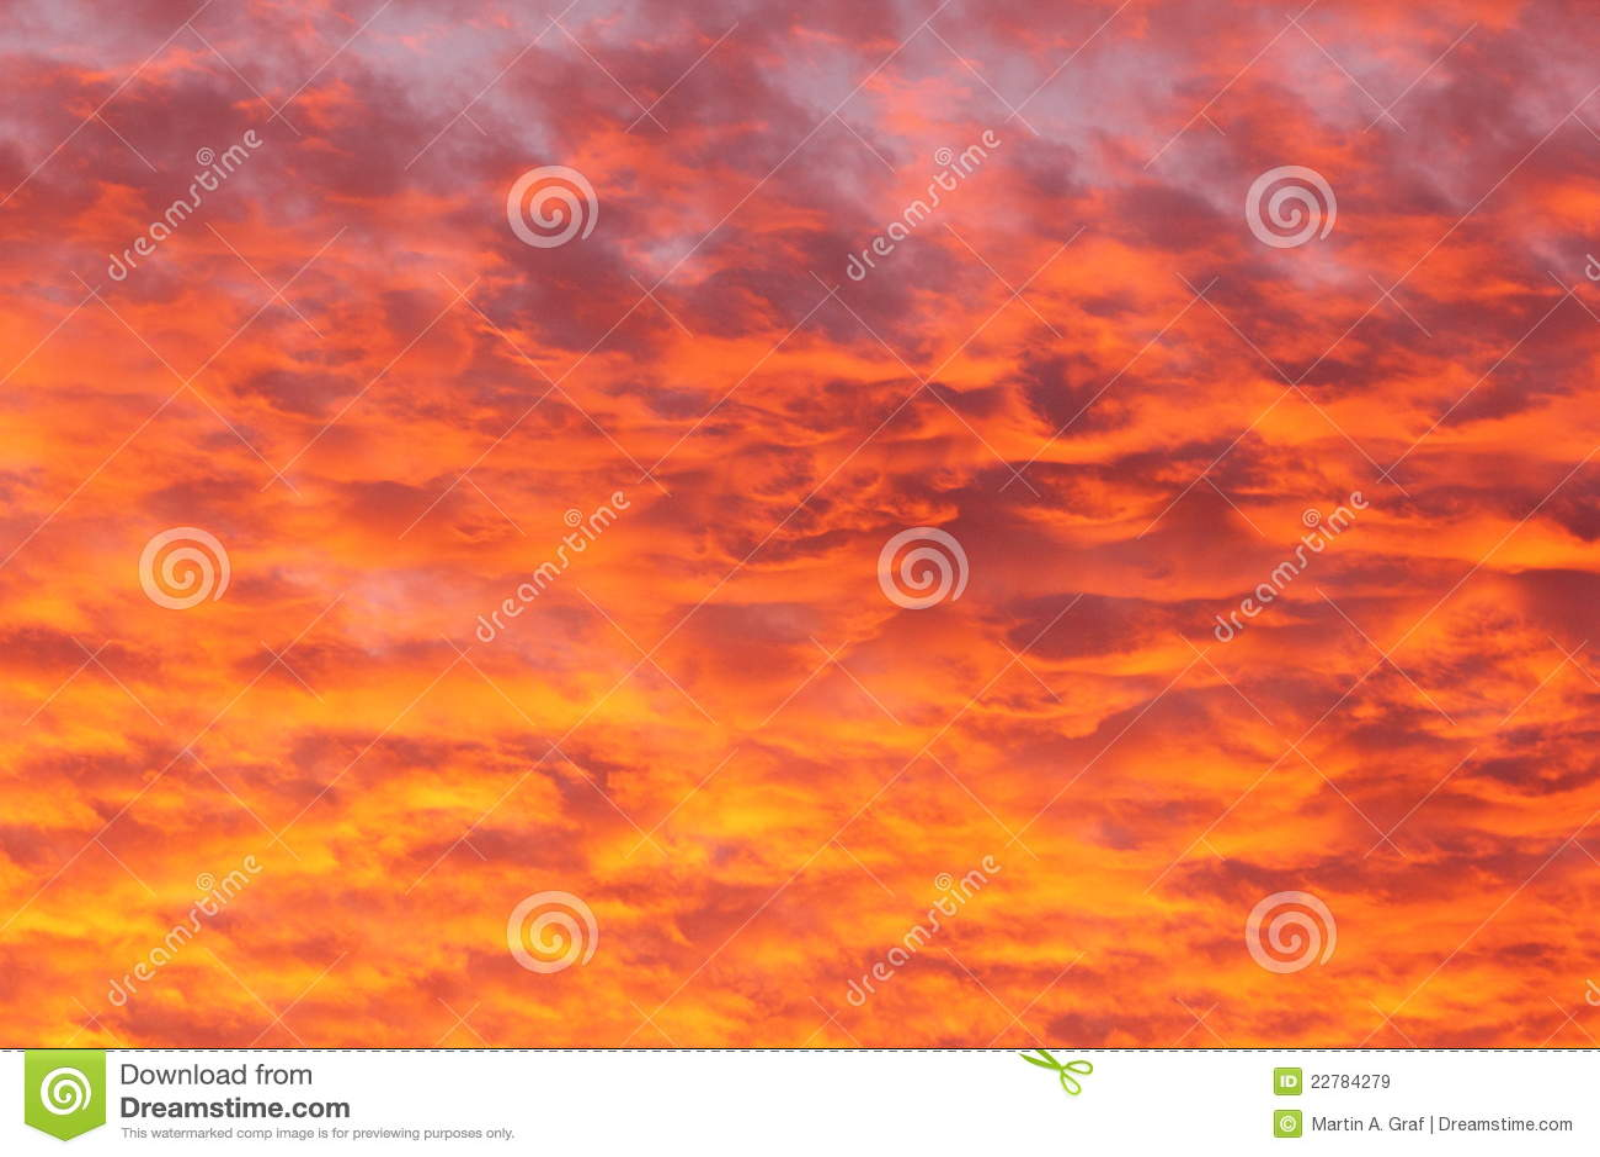 Download χρυσό ηλιοβασίλεμα στοκ εικόνα. εικόνα από χνουδωτός - 22784279